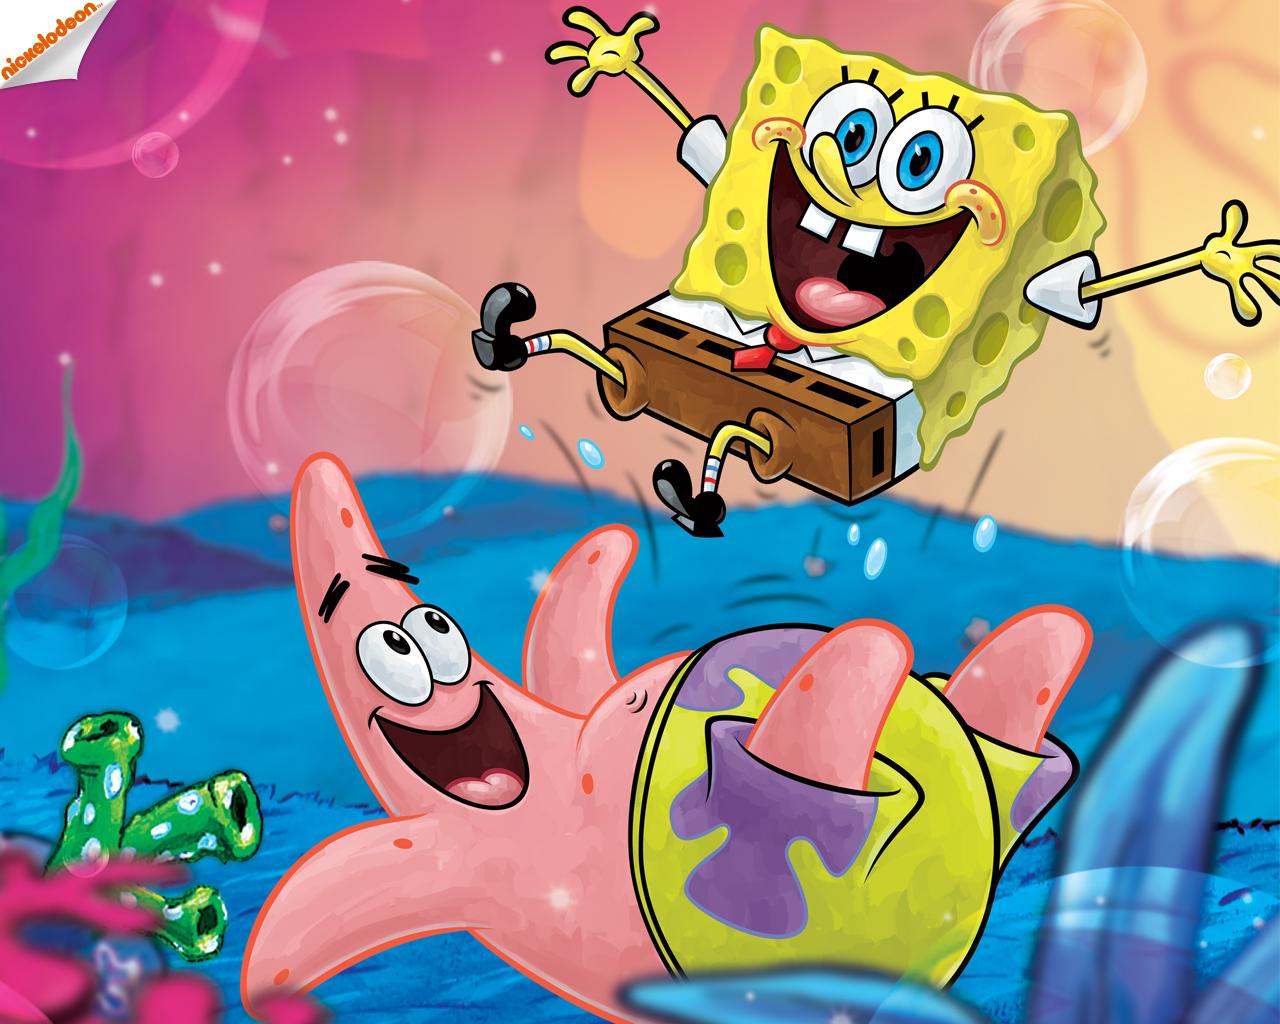 Spongebob Squarepants Images Spongebob And Patrick Wallpaper Hd